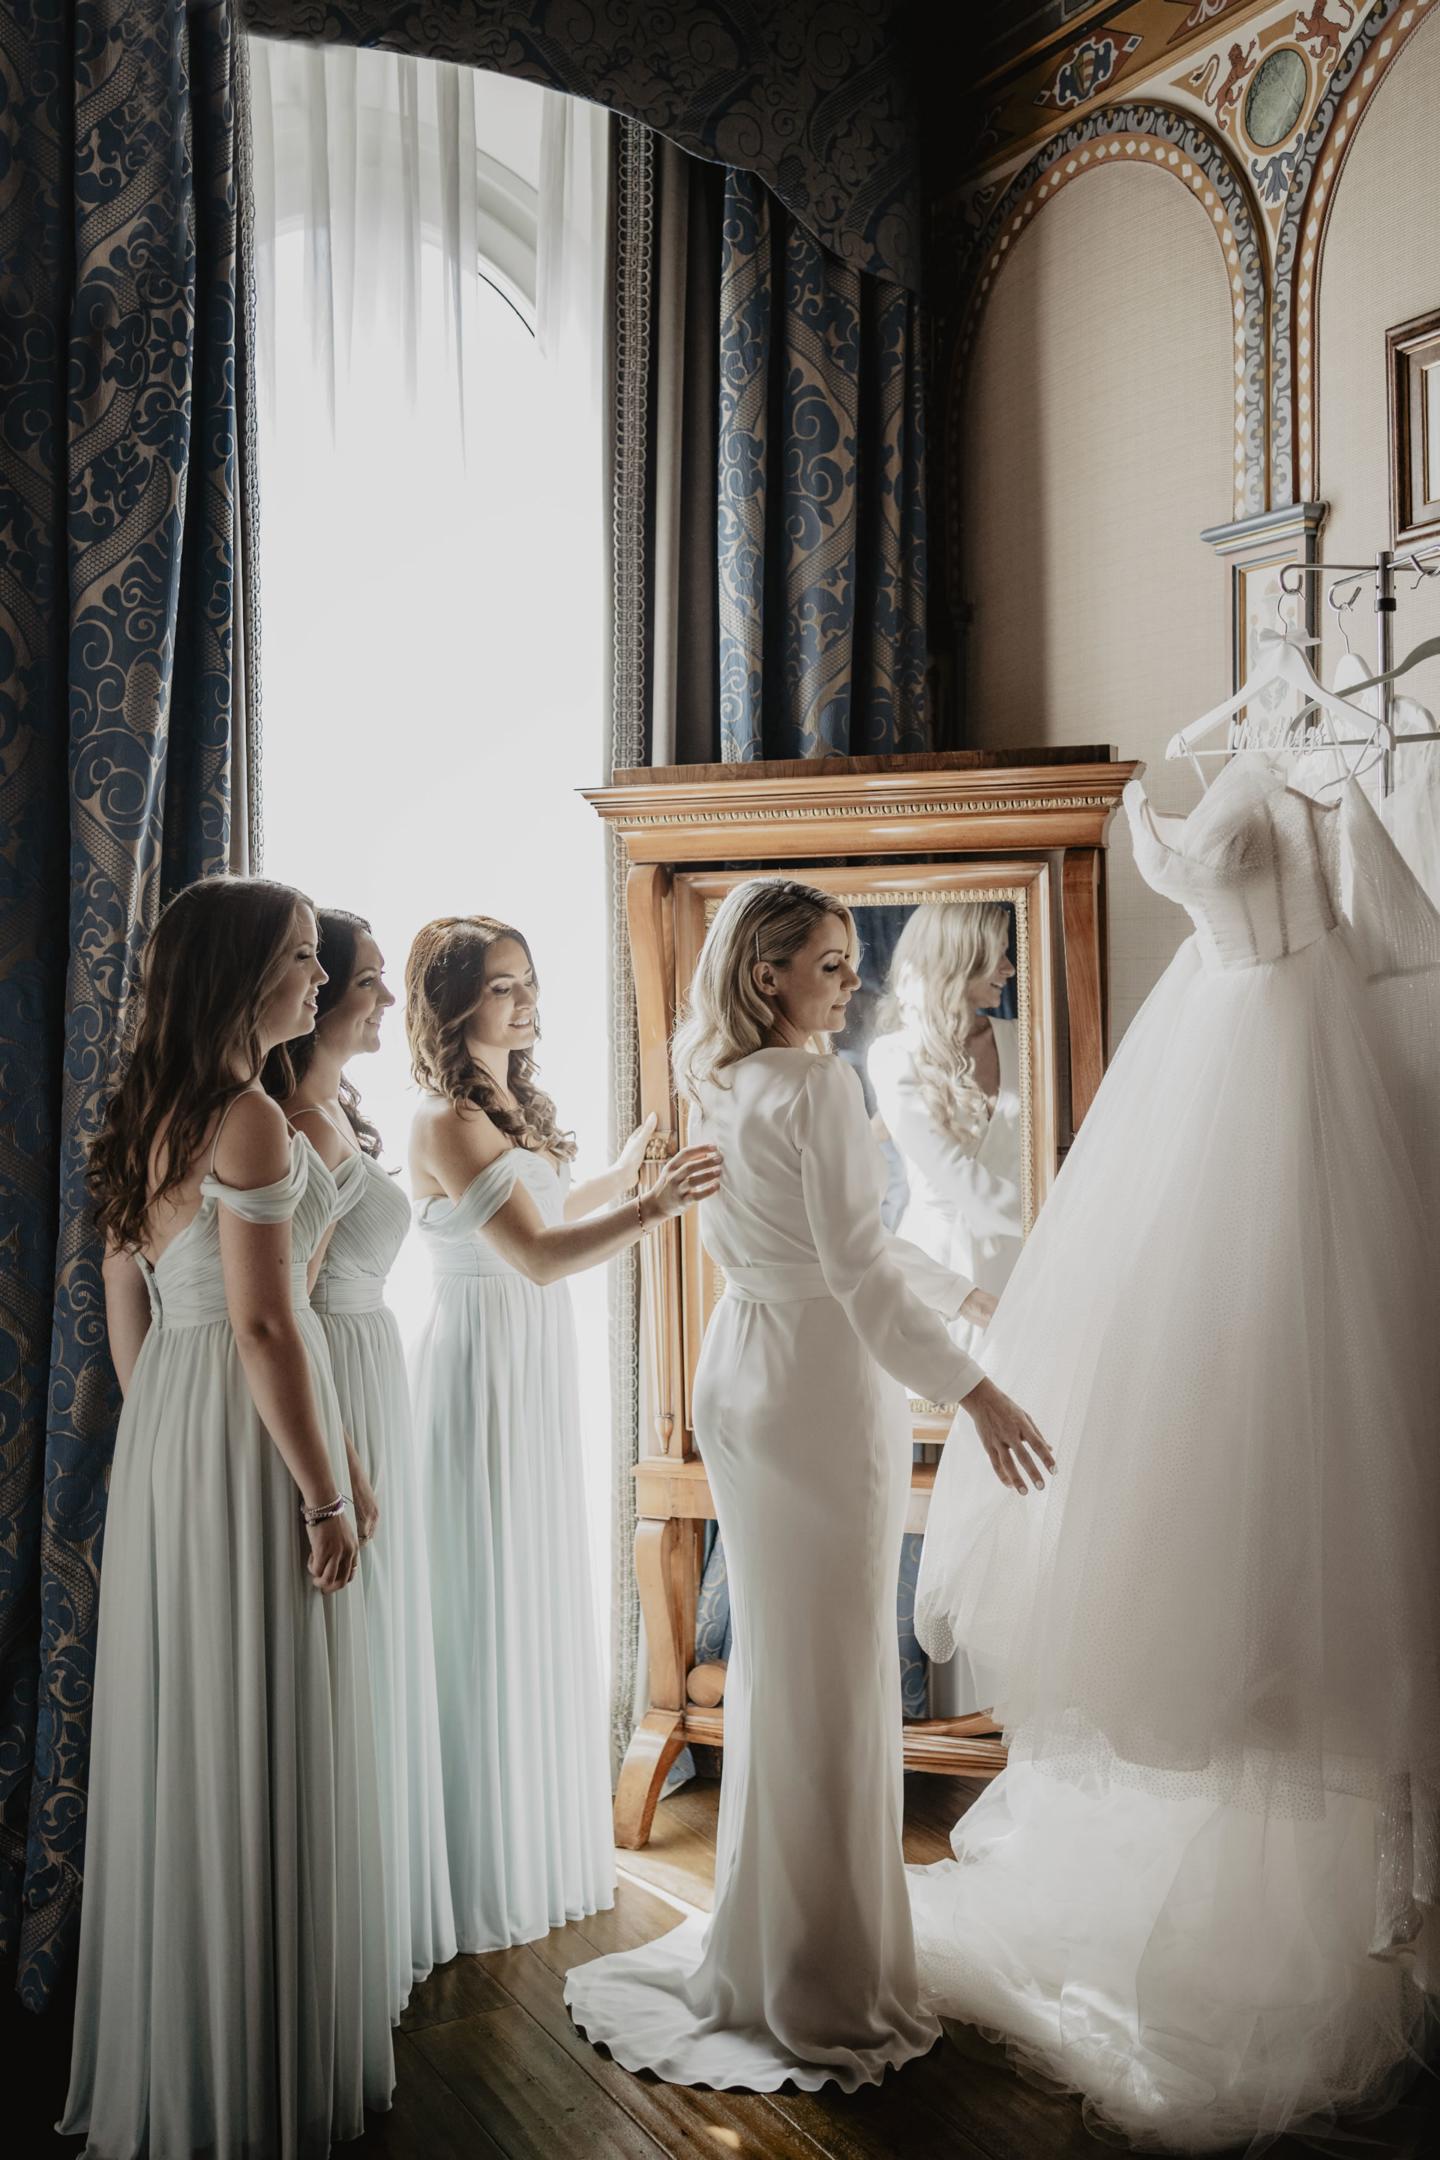 A sparkling wedding in the shore of the Arno - 14 :: A sparkling wedding on the shore of the Arno :: Luxury wedding photography - 13 :: A sparkling wedding in the shore of the Arno - 14